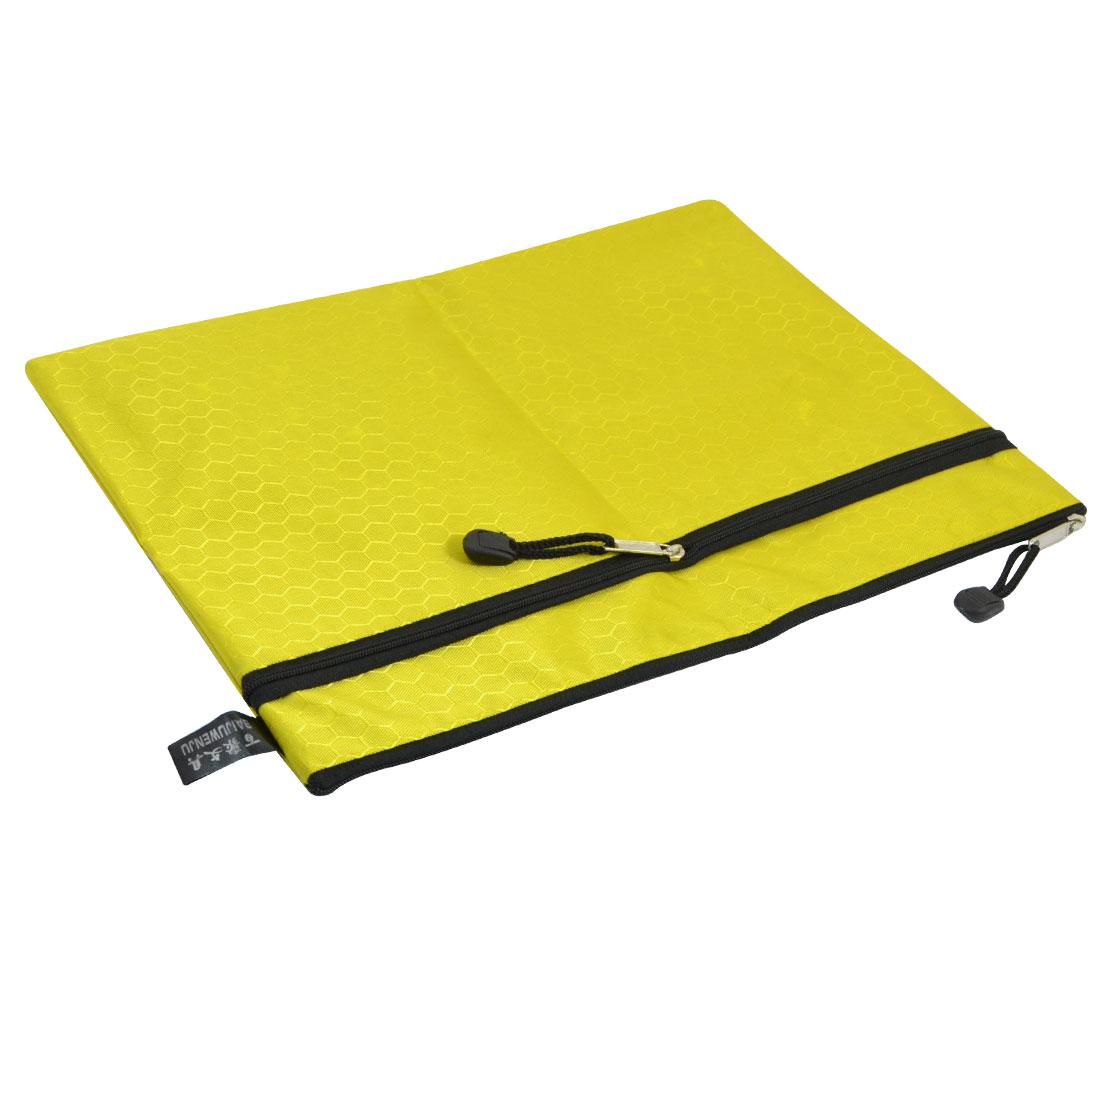 Yellow Nylon Hexagon Printed 2 Slots A4 Files Document Organizer Zipper Bag